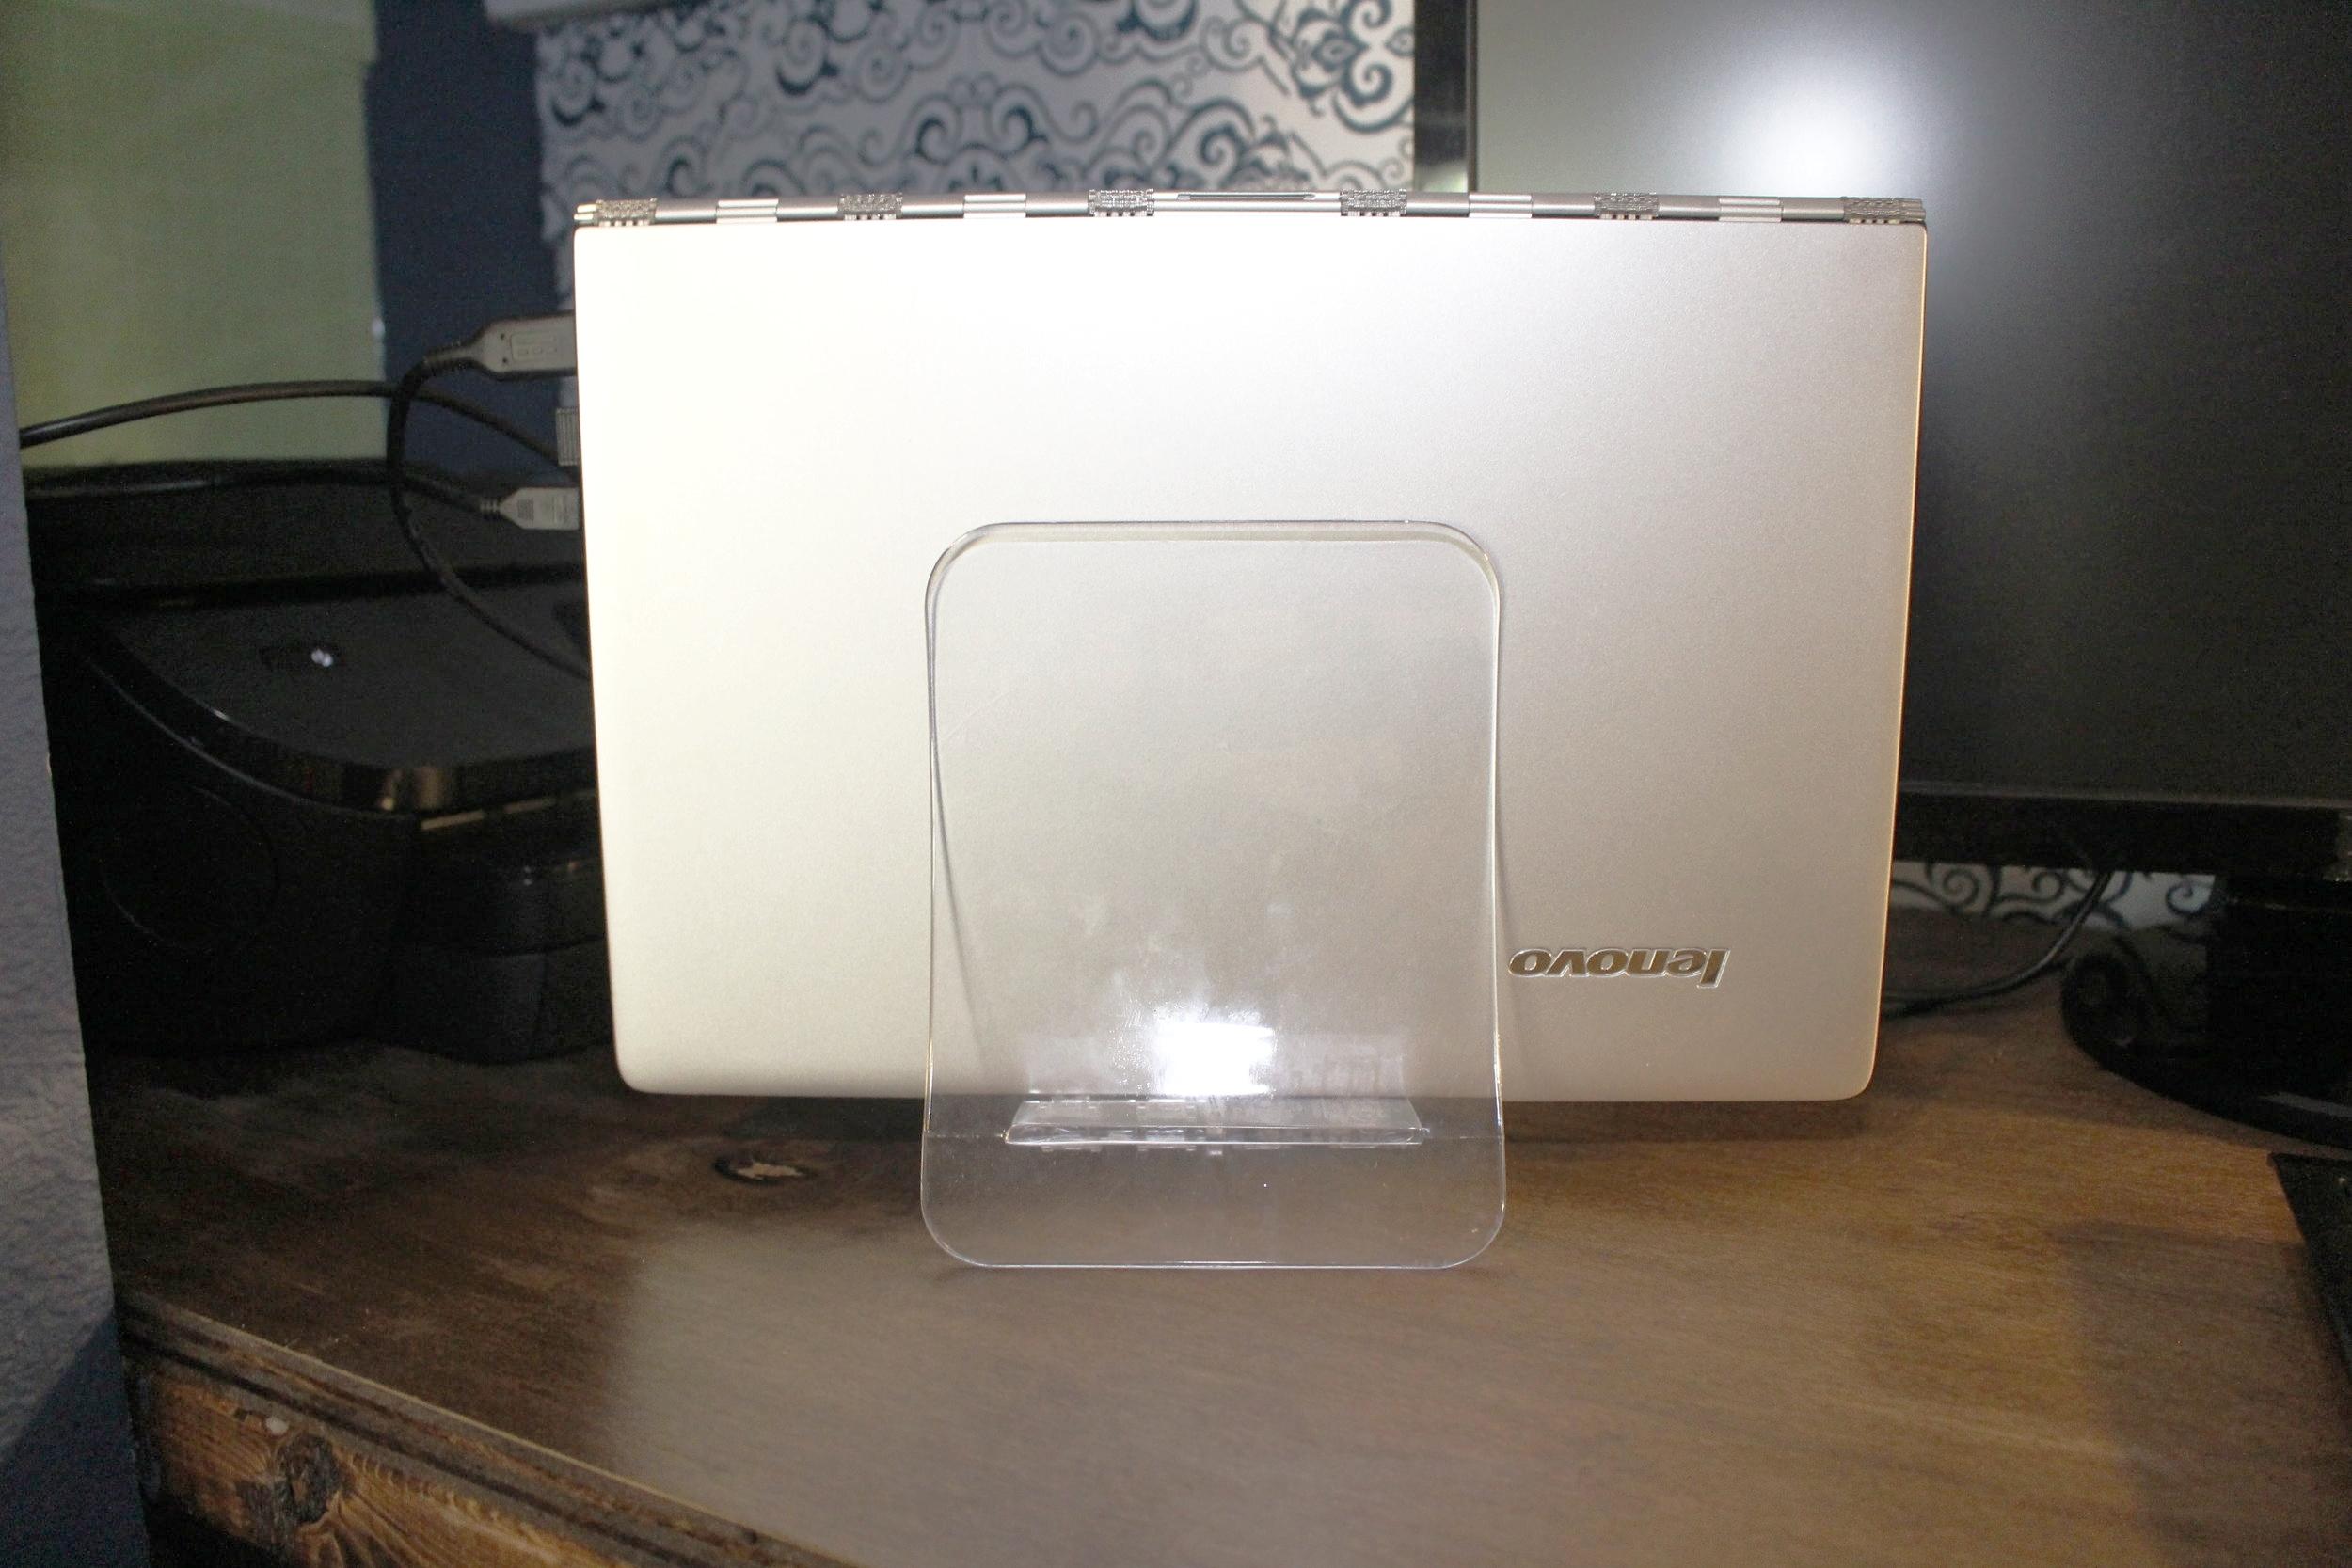 Ikea napkin holder as laptop stand